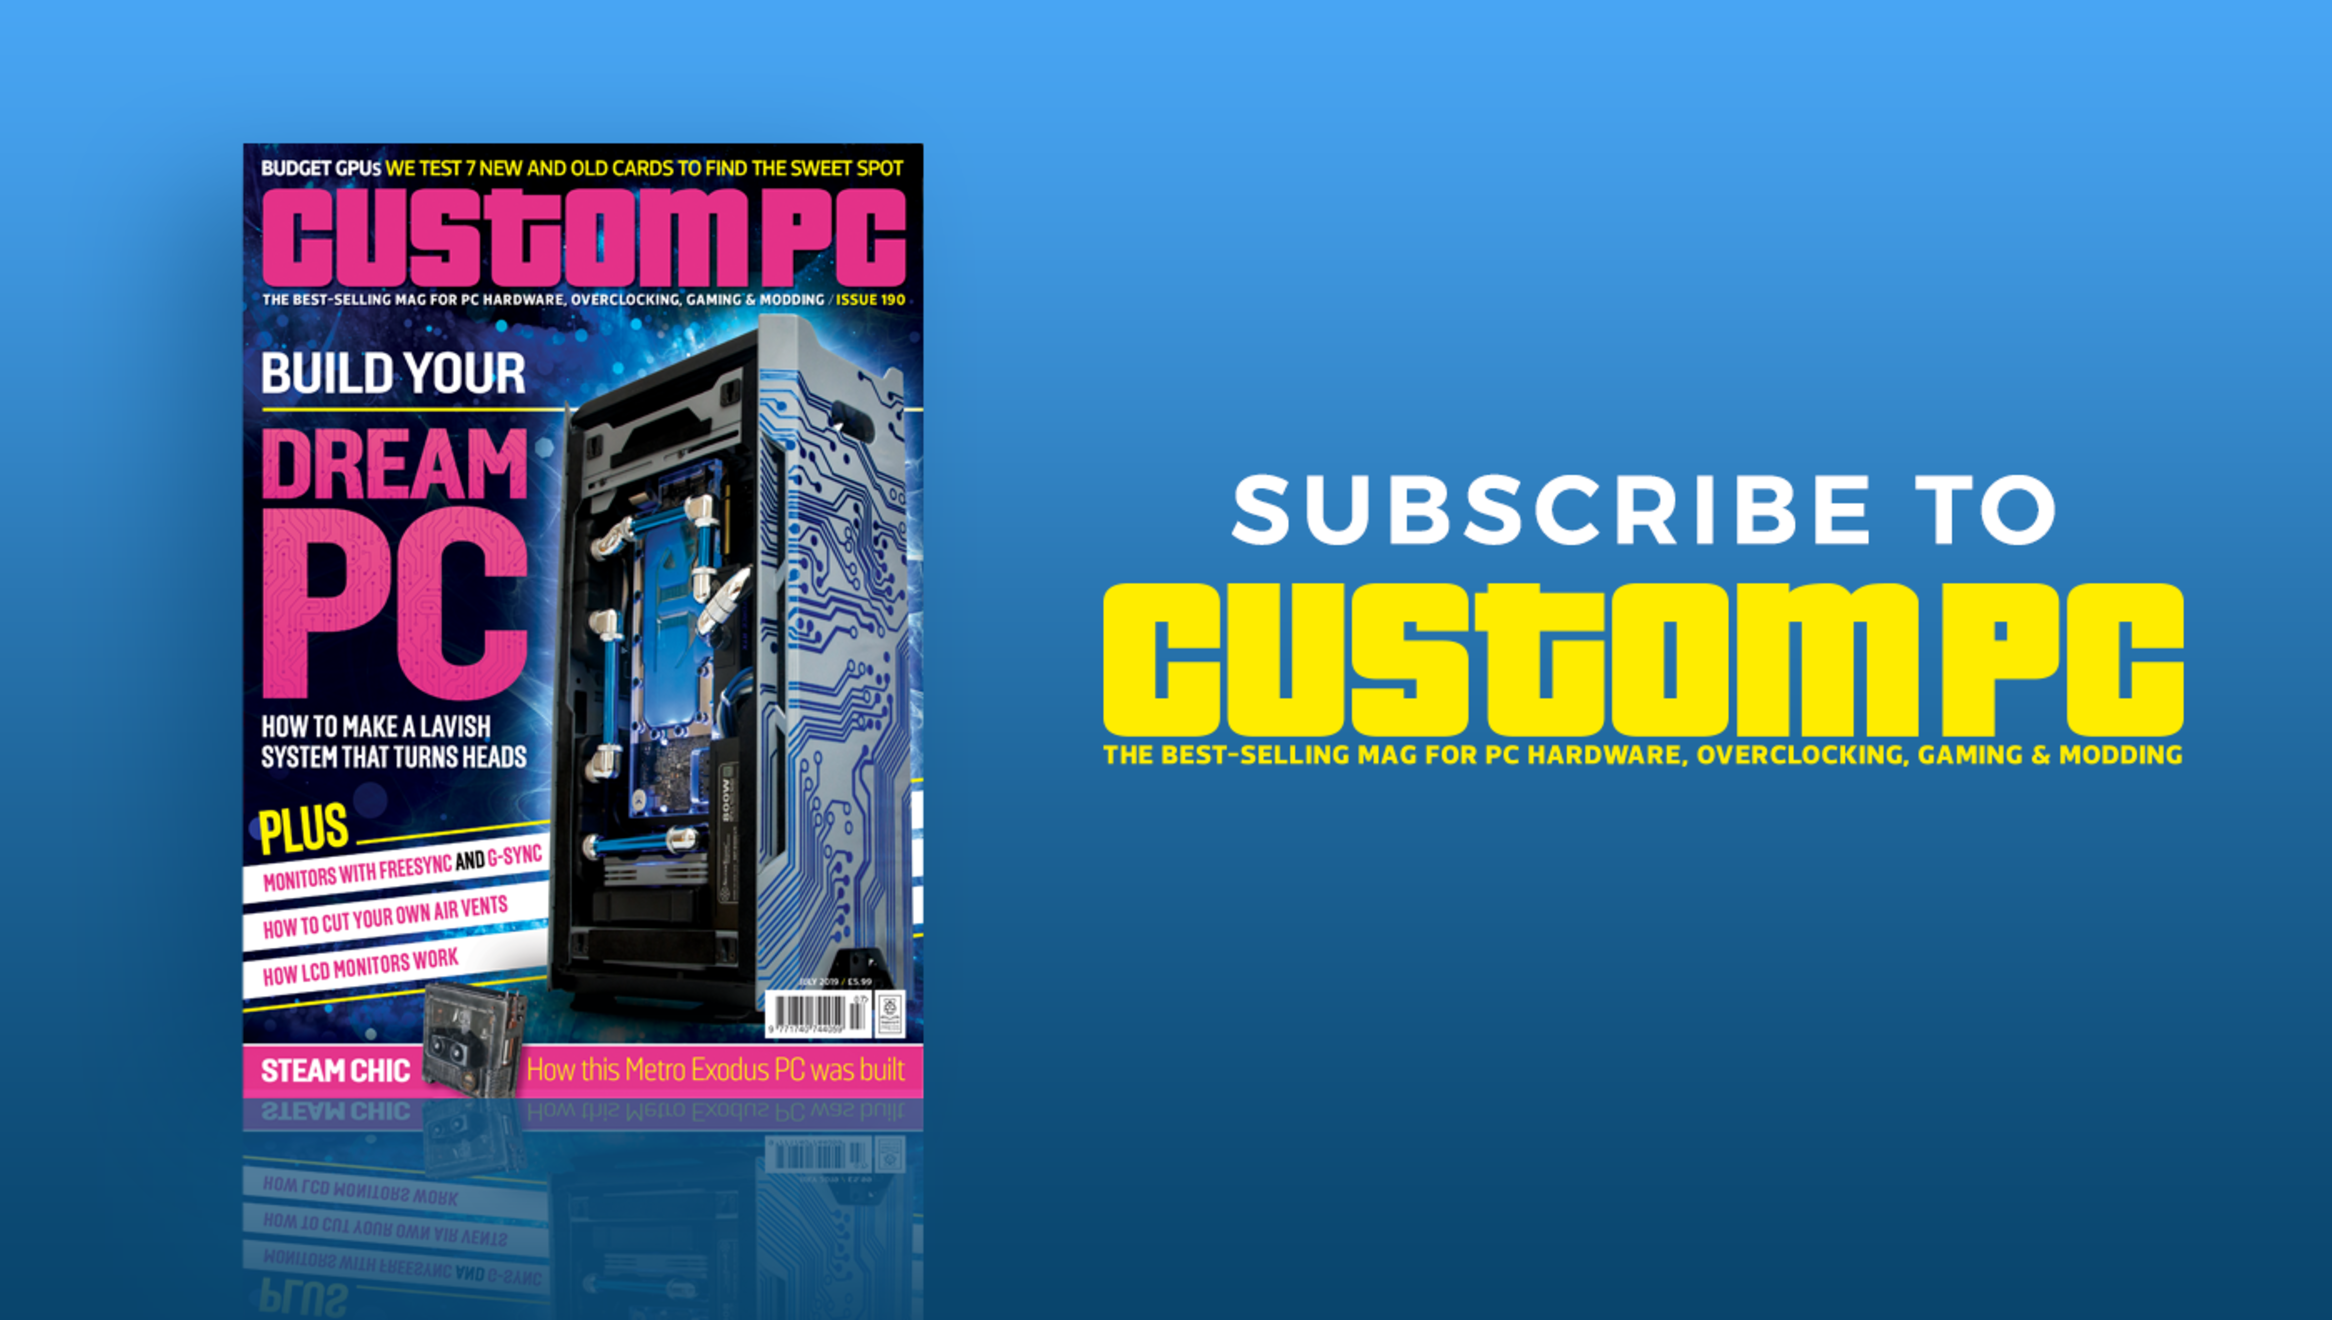 Subscribe to Custom PC magazine